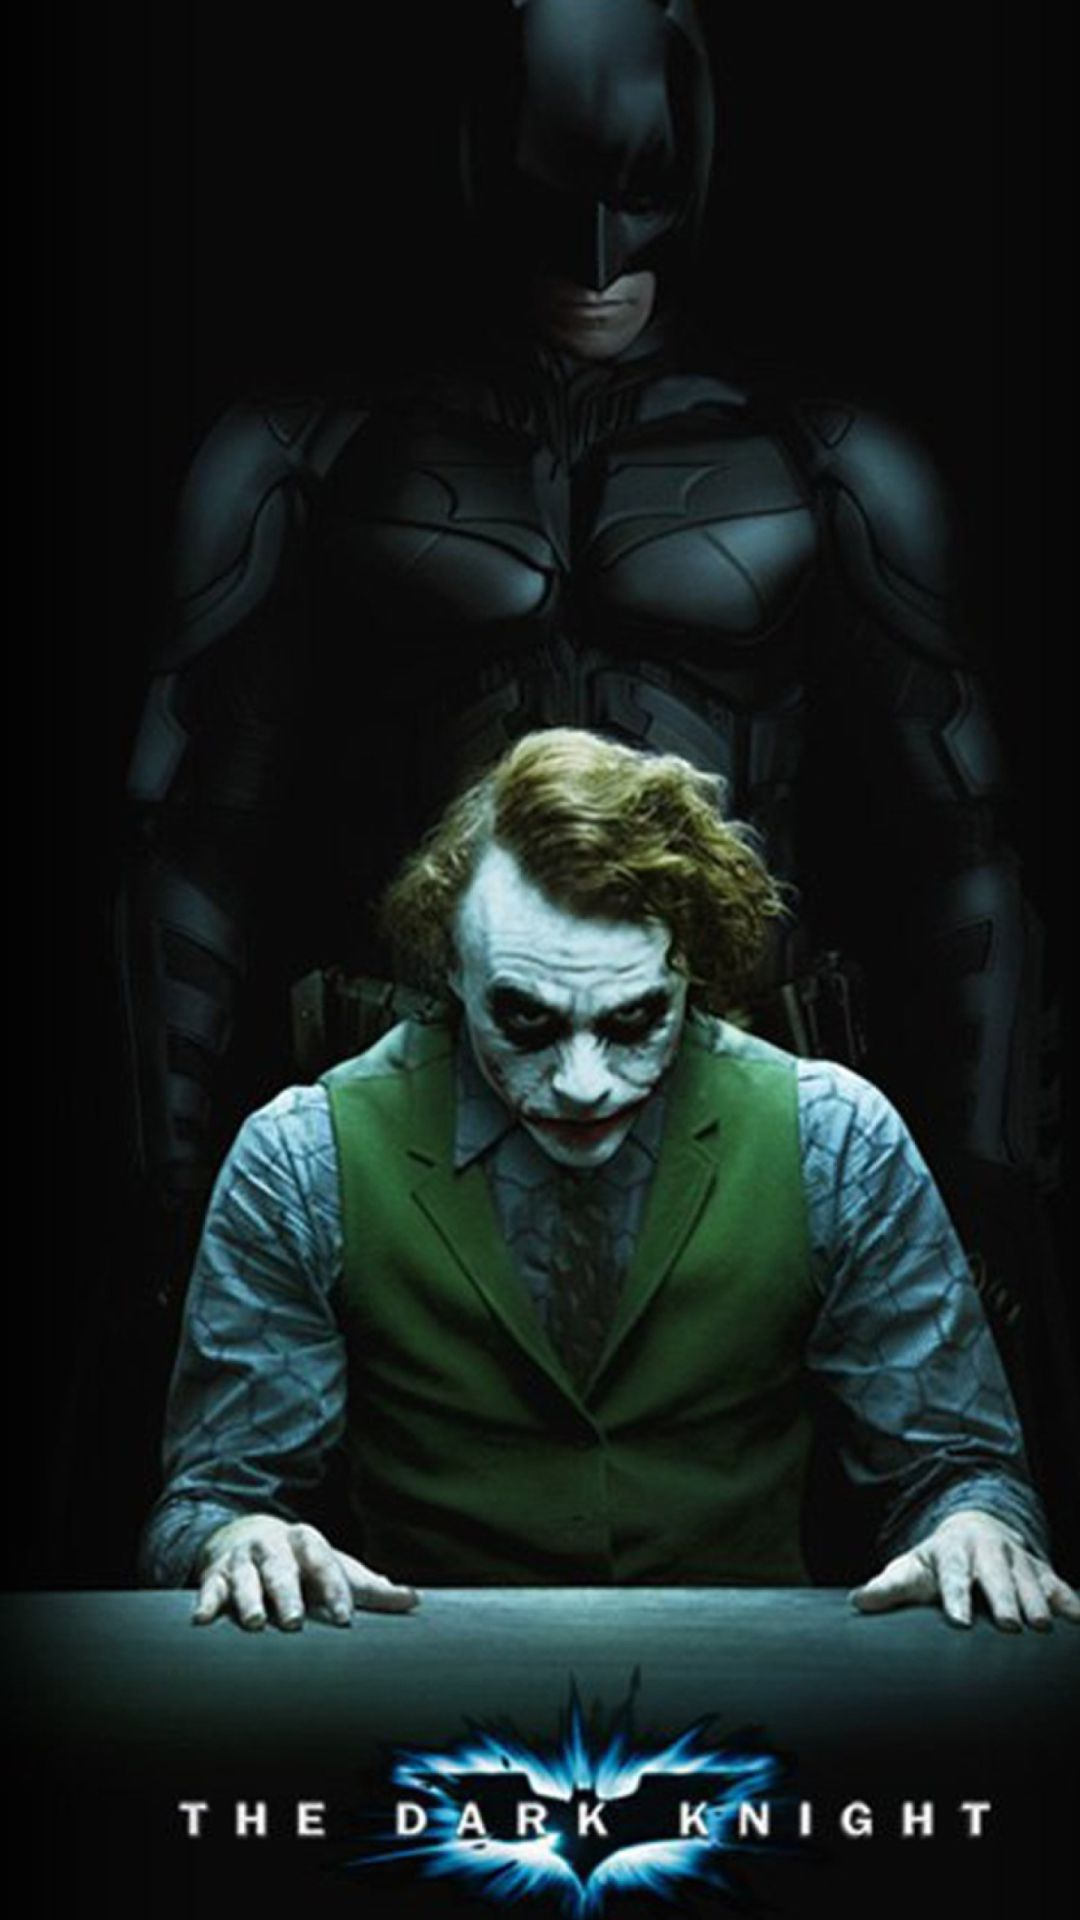 Joker Dark Knight Iphone Hd Wallpapers Wallpaper Cave